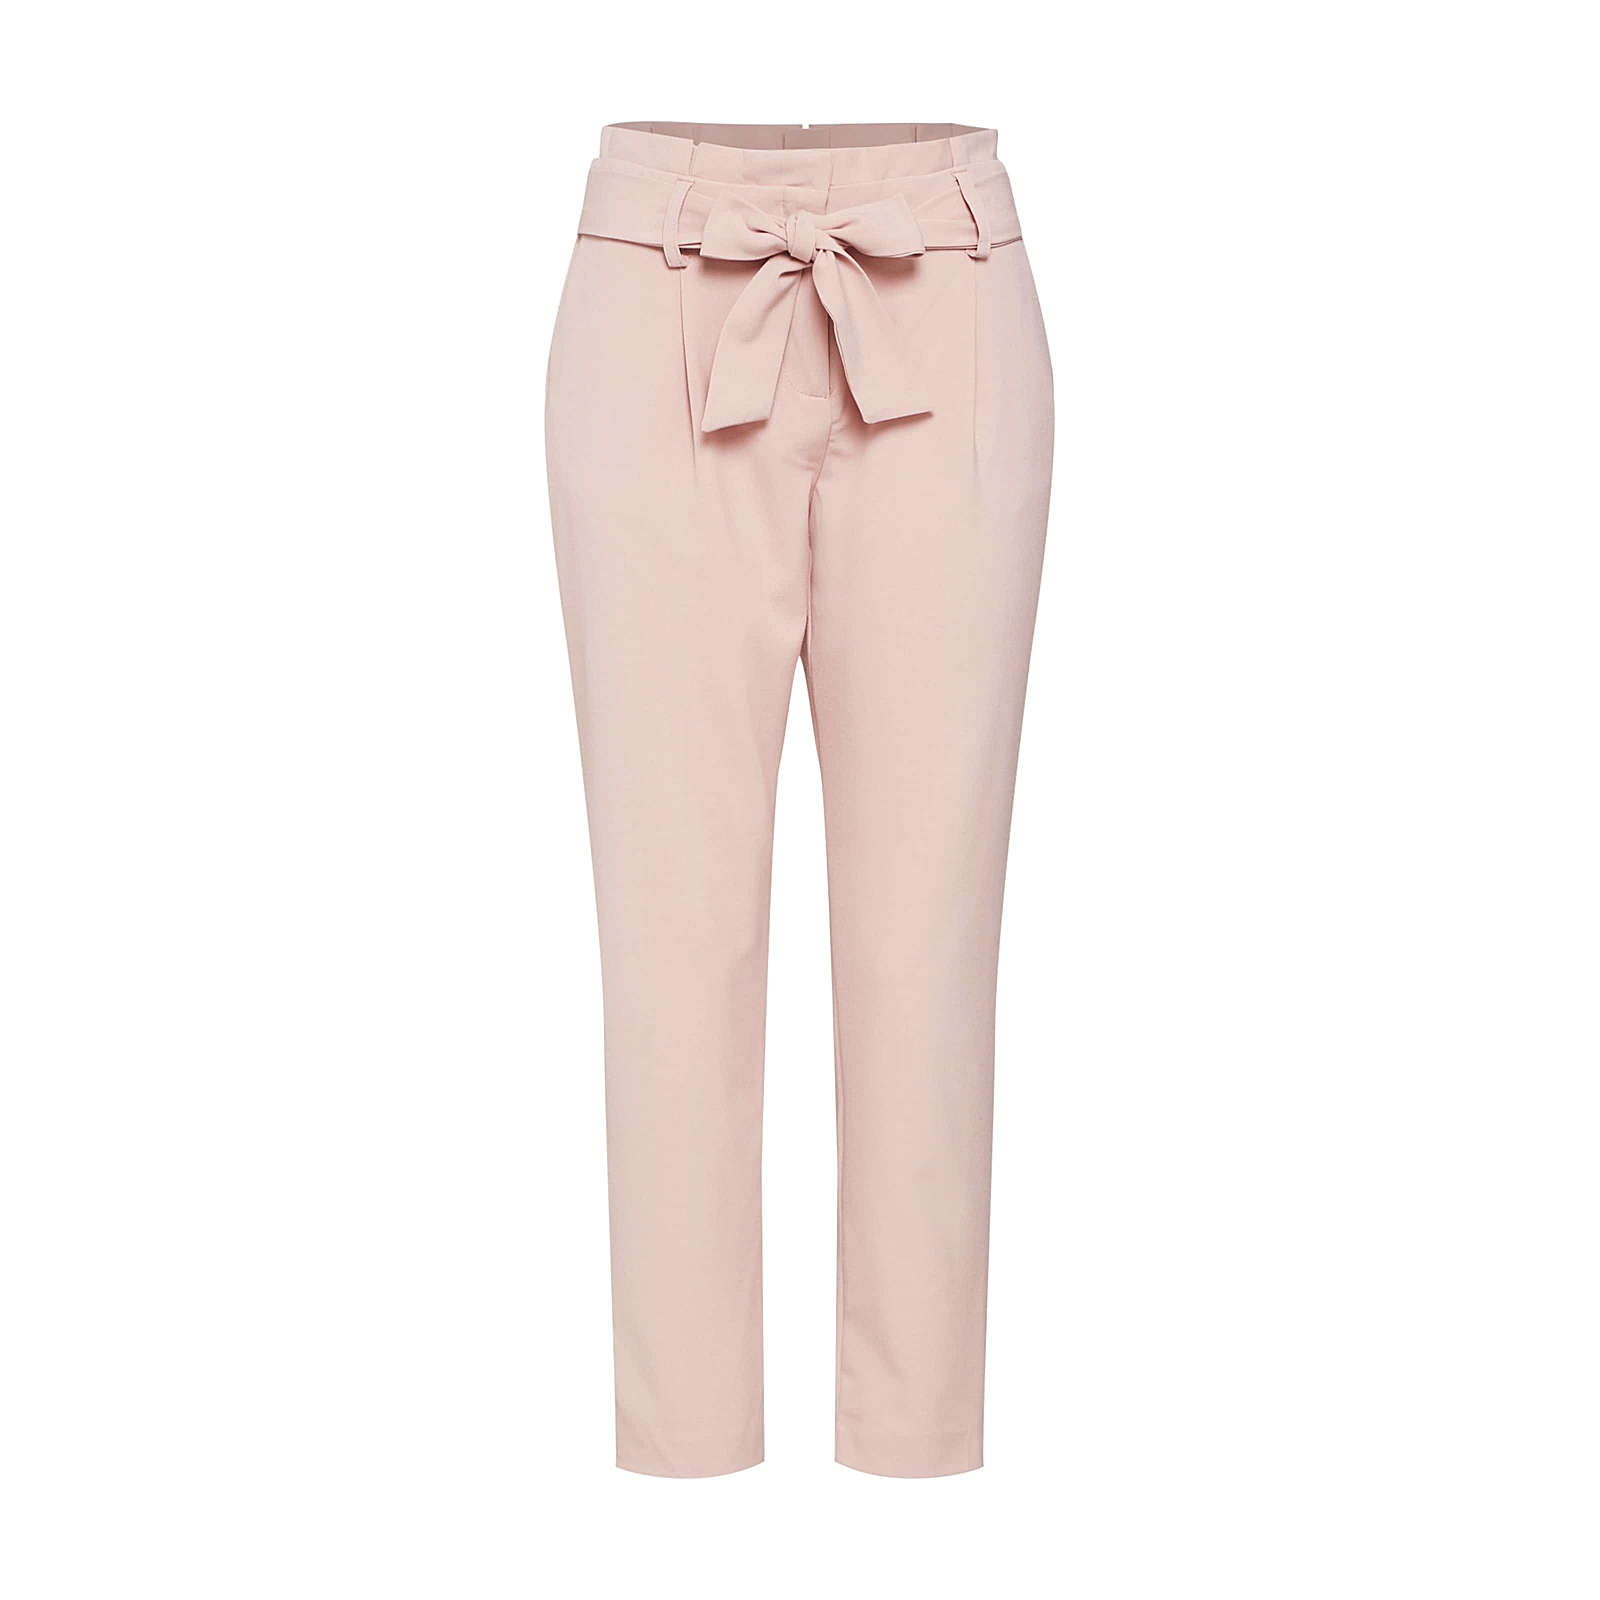 ONLY Bundfaltenhose FINI Stoffhosen rosa Damen Gr. 42